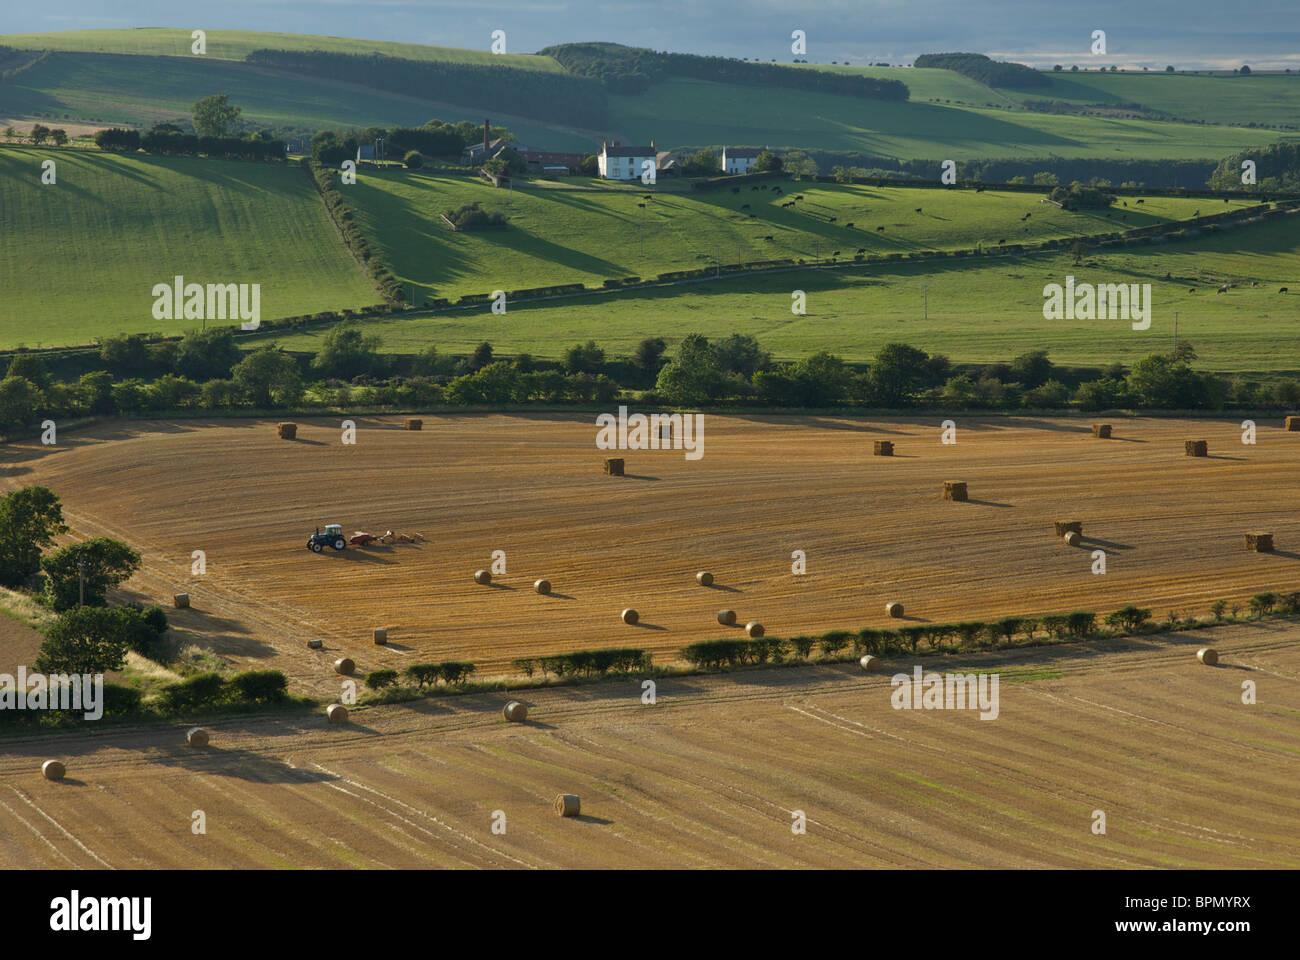 haymaking-near-kirk-yetholm-scottish-borders-scotland-uk-BPMYRX.jpg